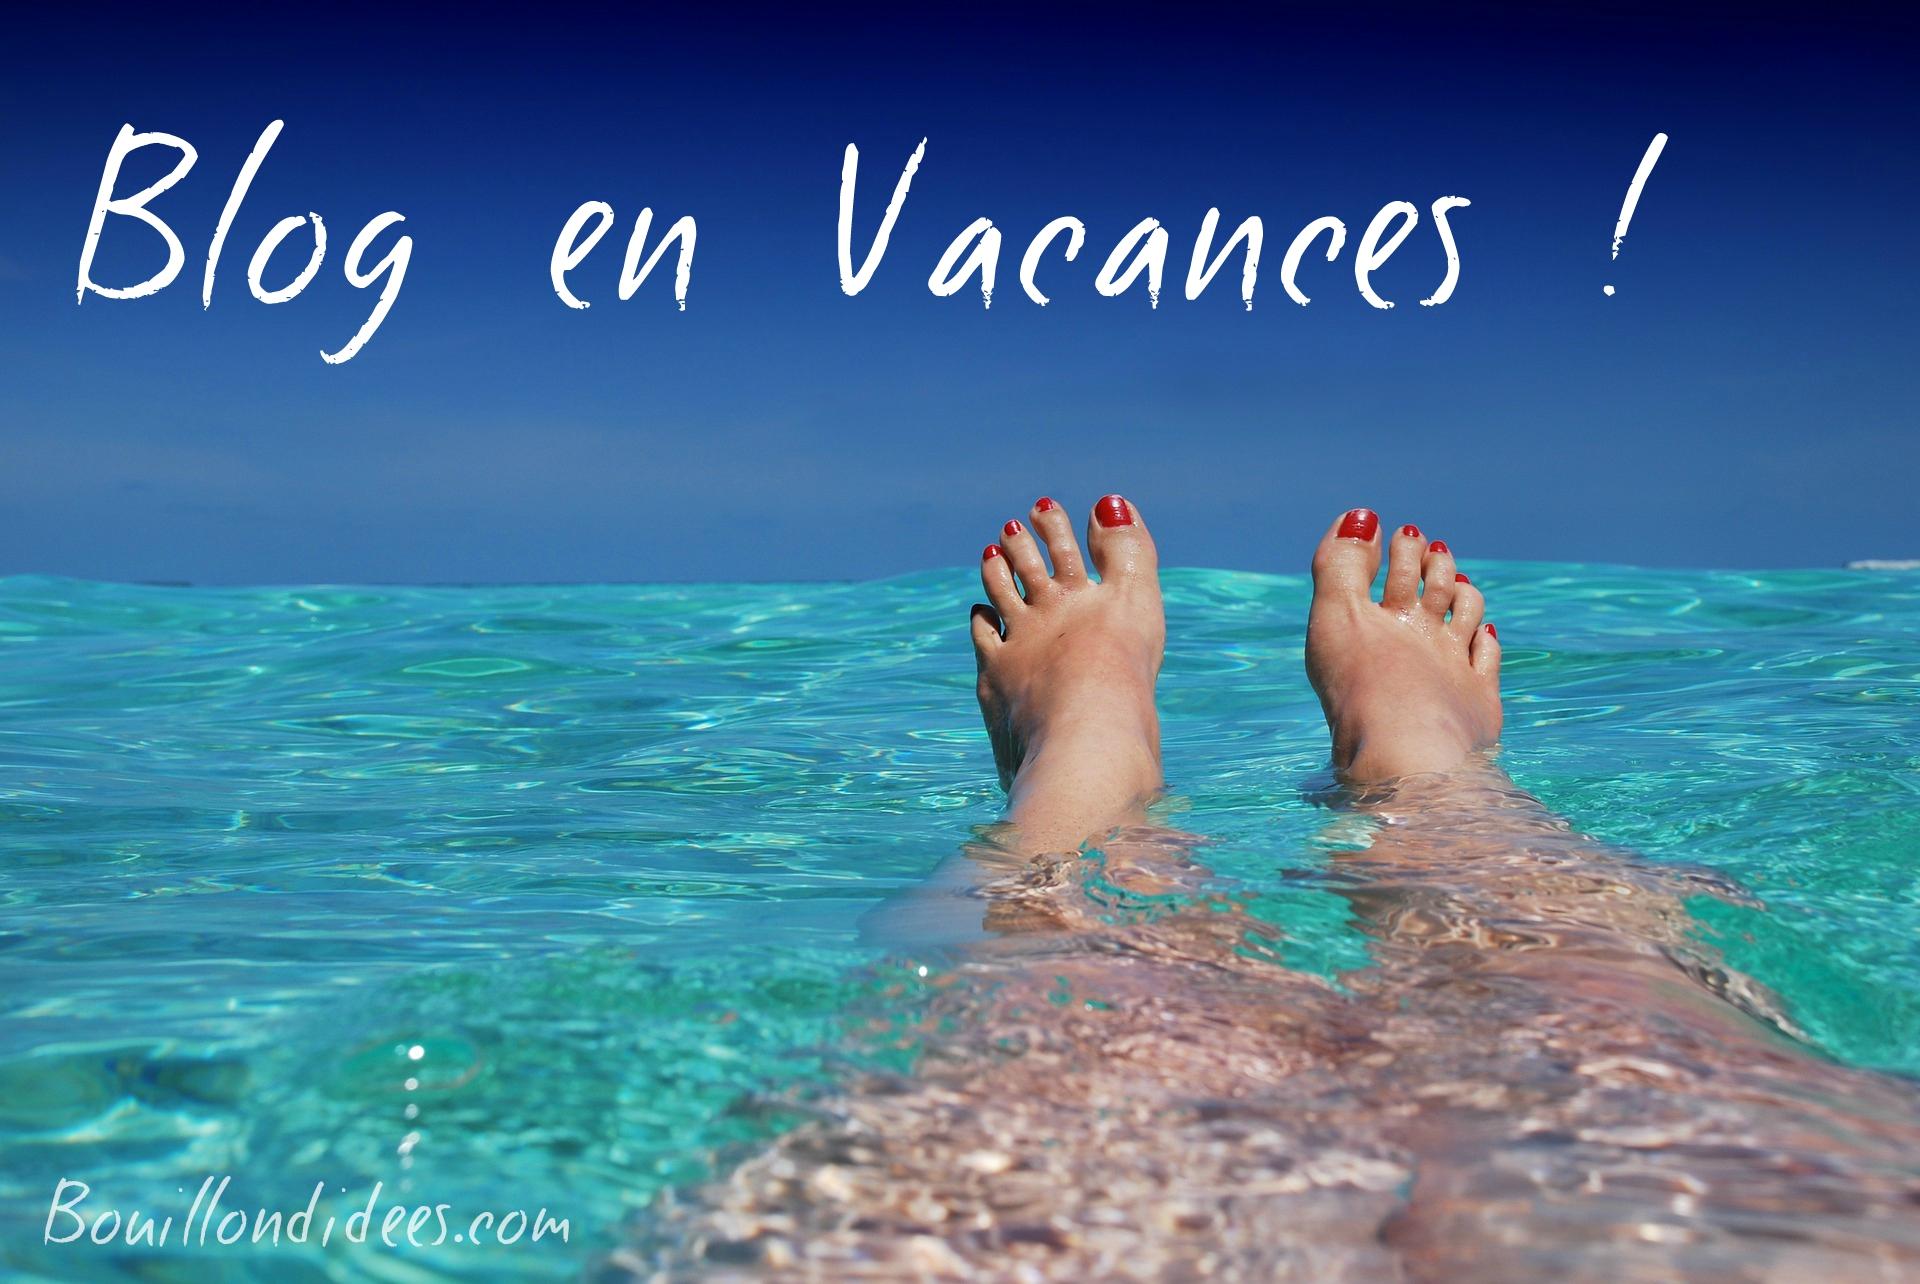 Blog en vacances2 Bouillondidees